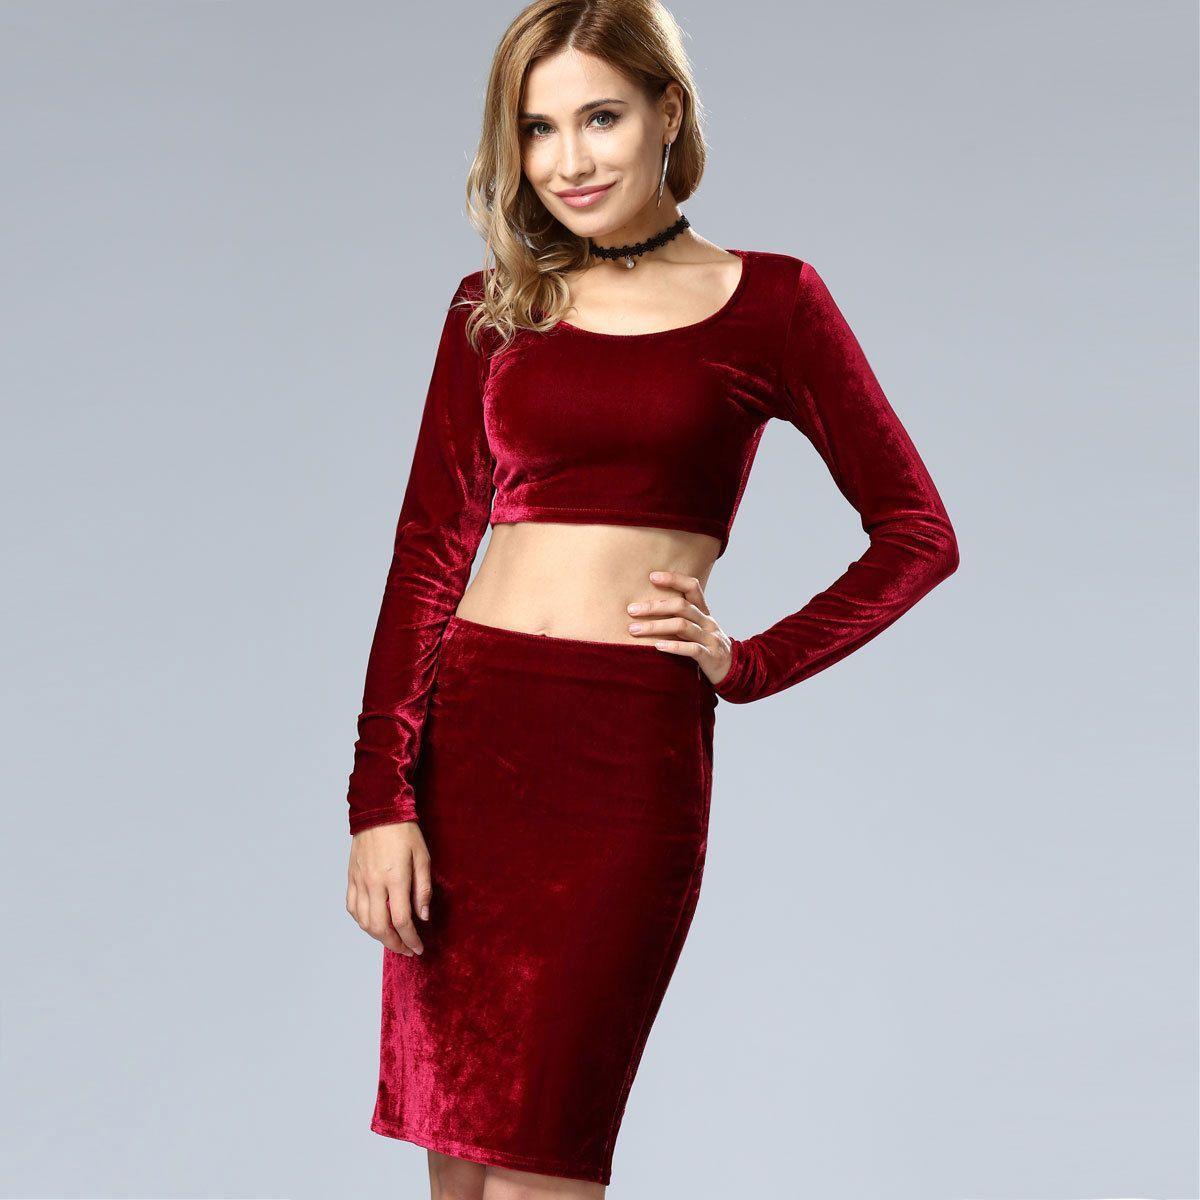 2 Piece Crop Top Skirt Set Long Sleeve Vest Slim Pencil Skirt